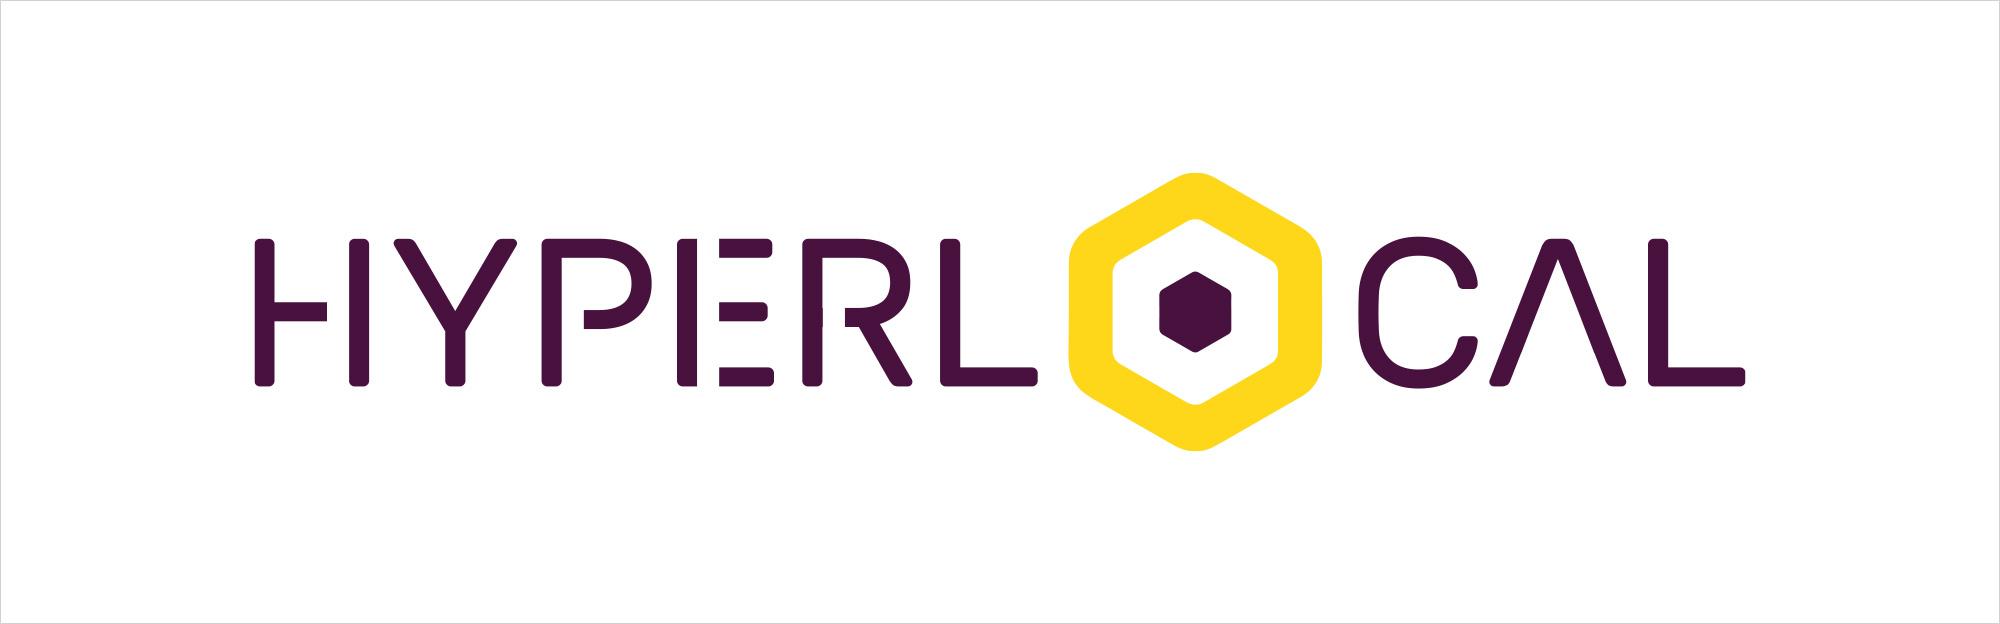 Hyperlocal logo